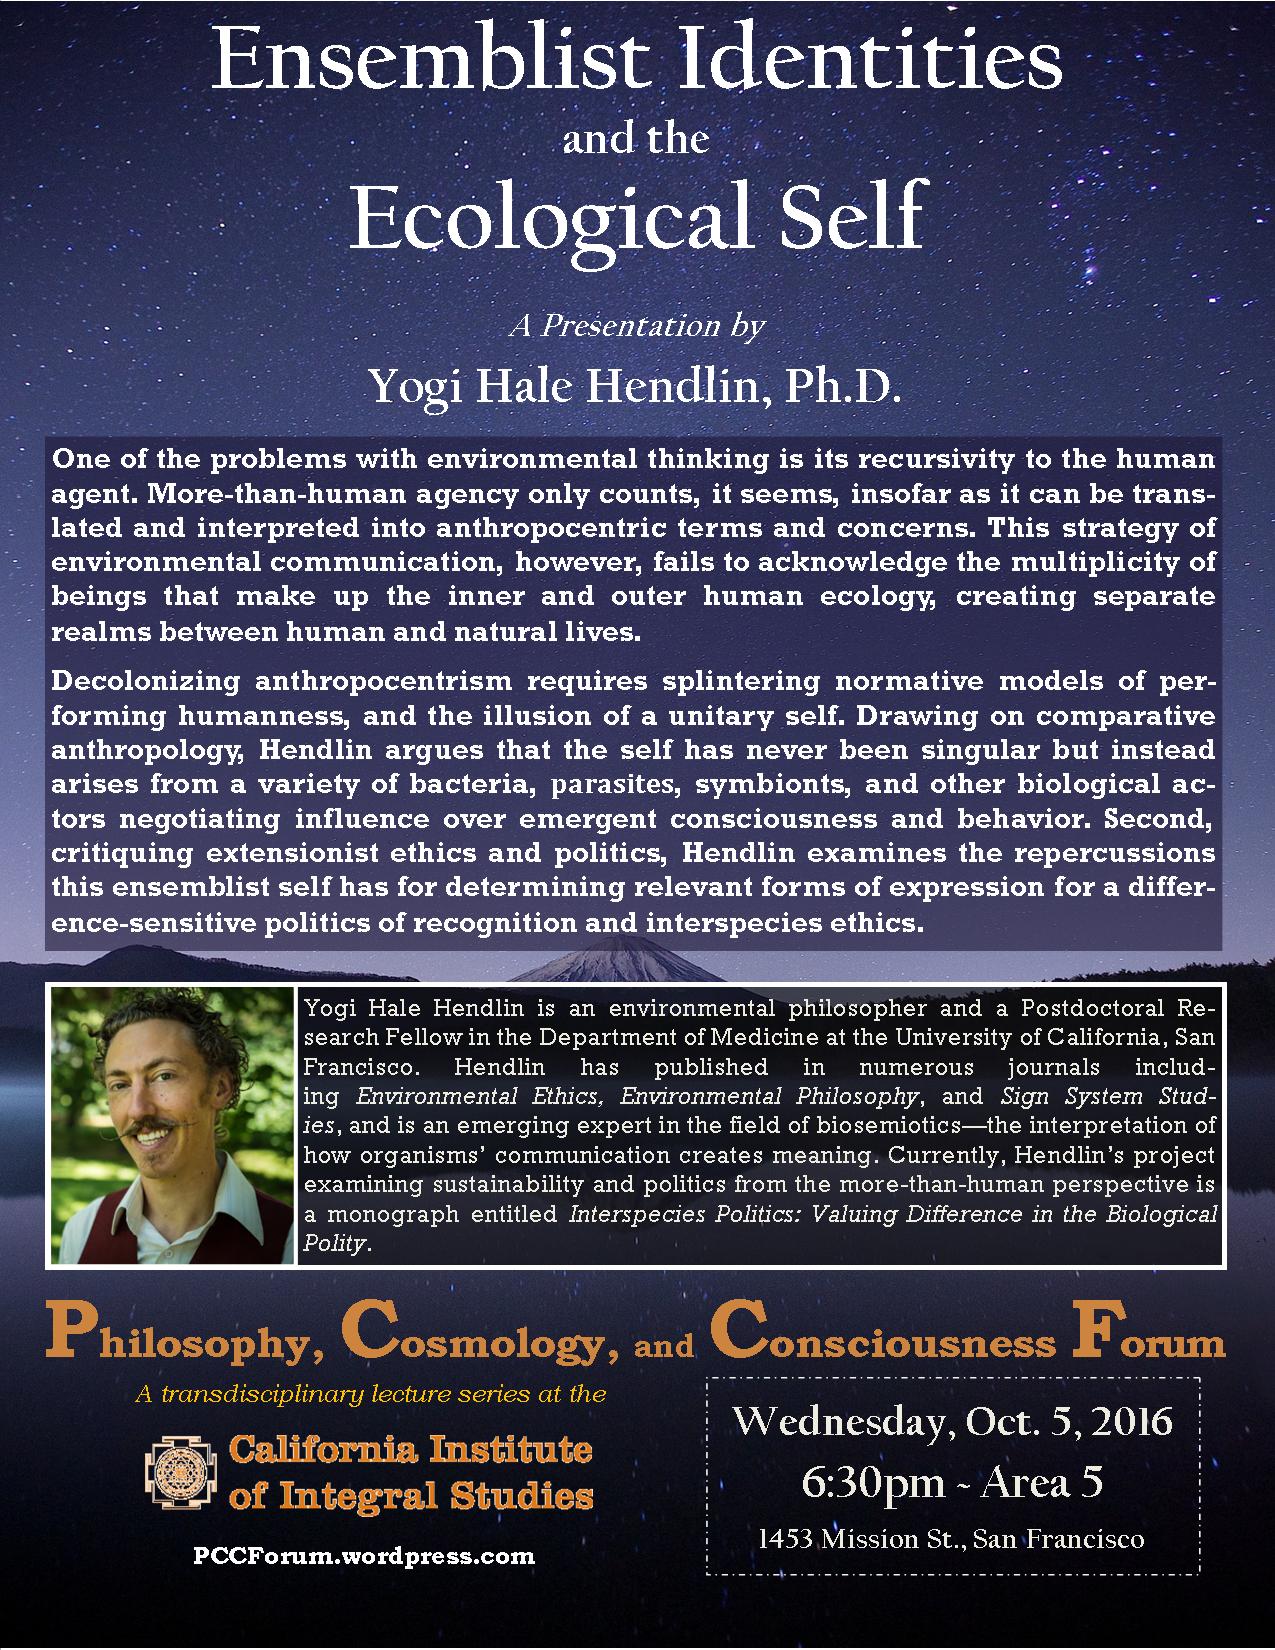 pcc-forum-yogi-hendlin